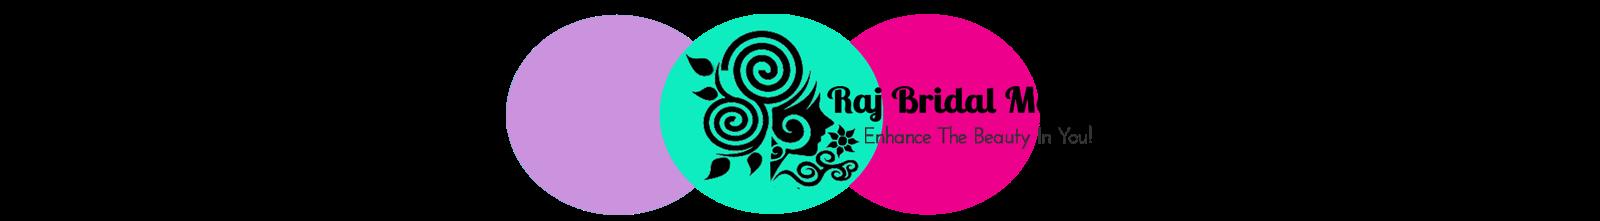 Raj Bridal Makeup | Professional Makeup-Artist